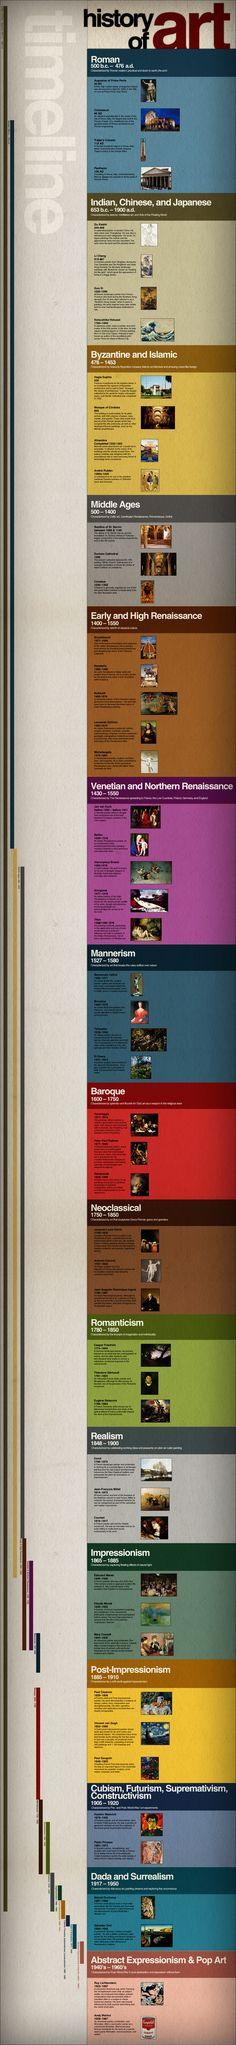 http://lib.store.yahoo.net/lib/madisonartshop/art-history-large.jpg